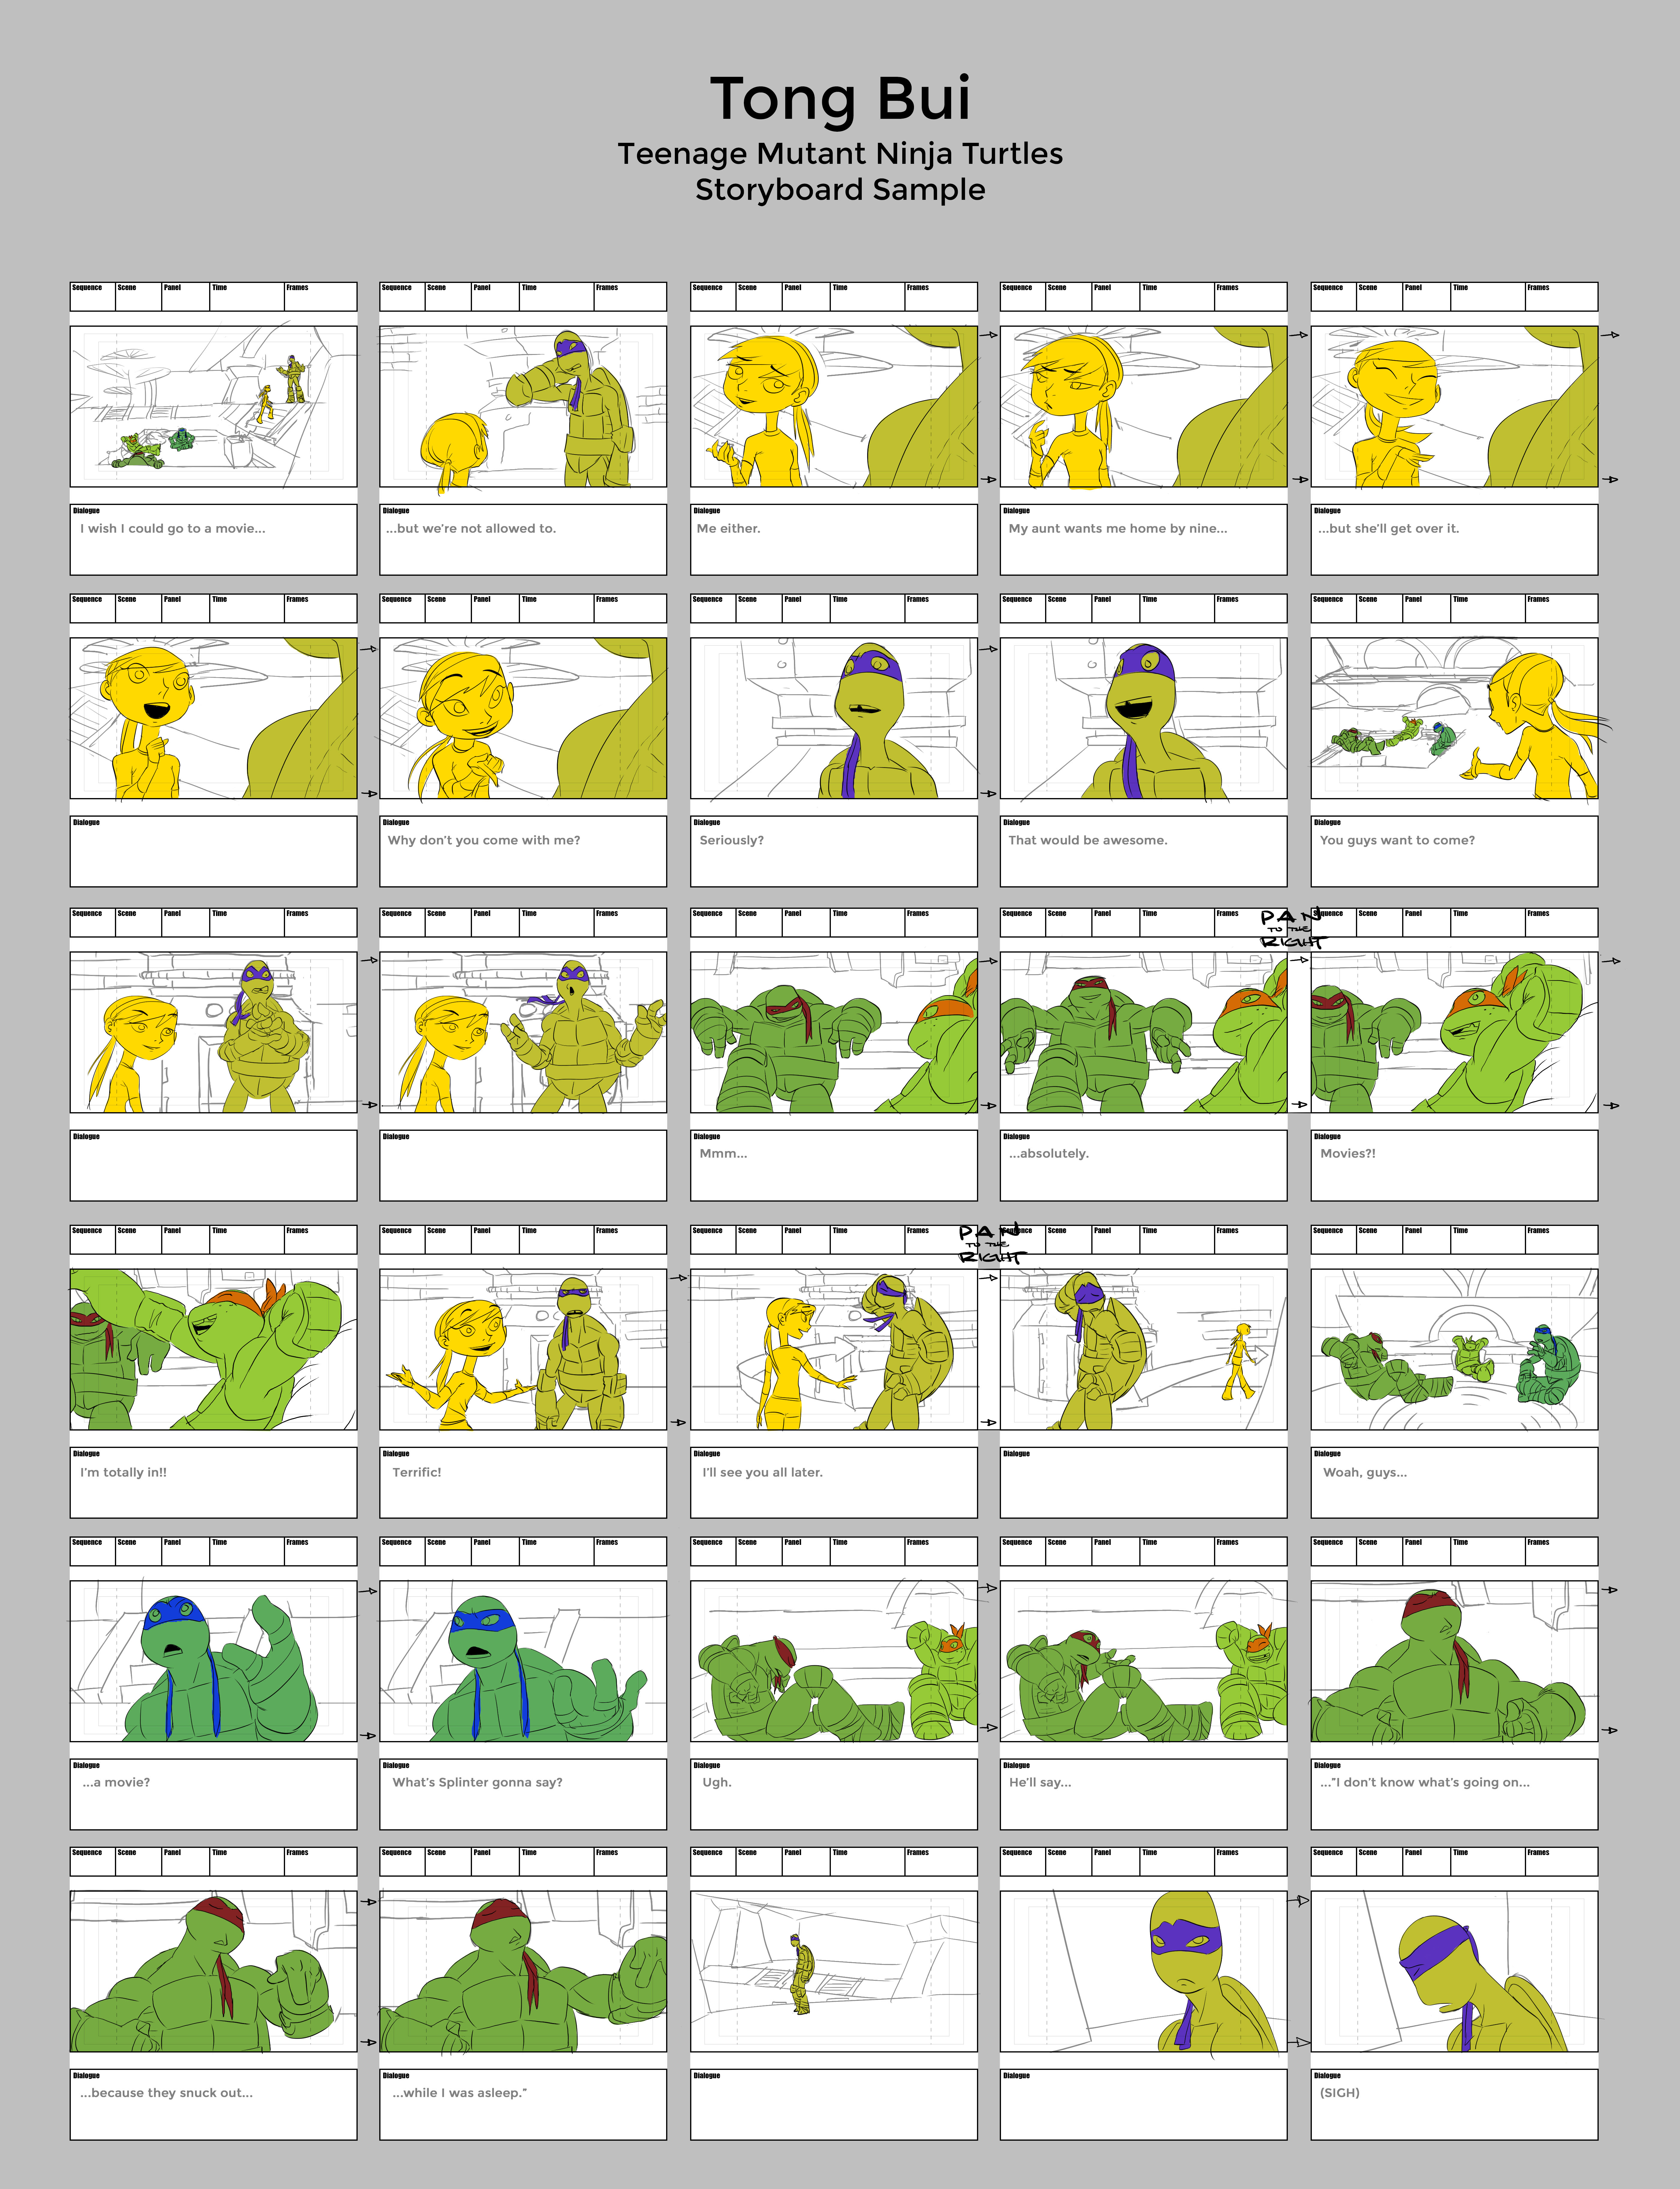 TMNT Storyboard Sample by Tongman on DeviantArt – Storyboard Sample